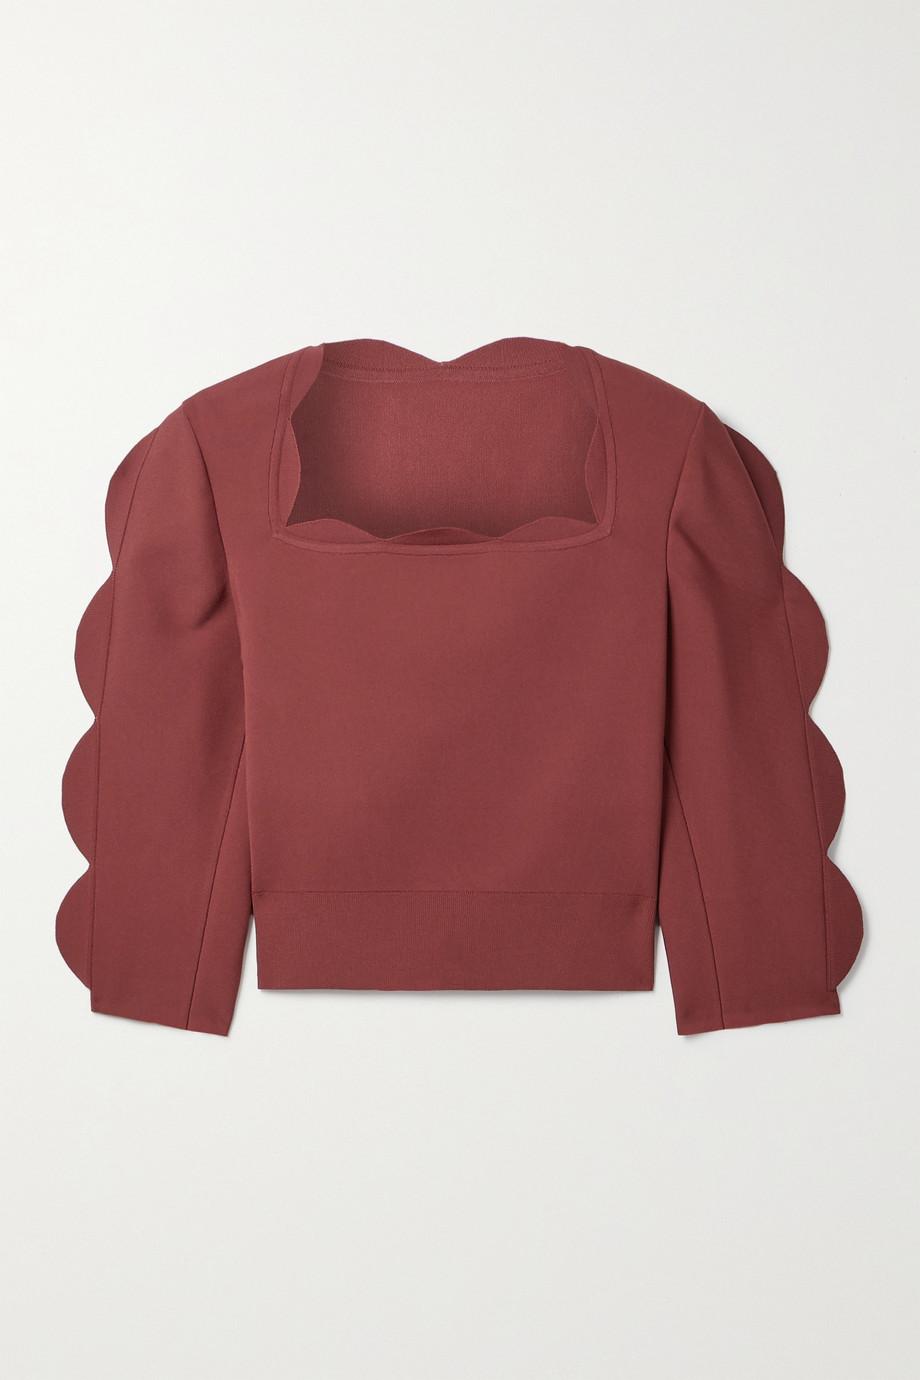 Alaïa Cropped scalloped stretch-knit top